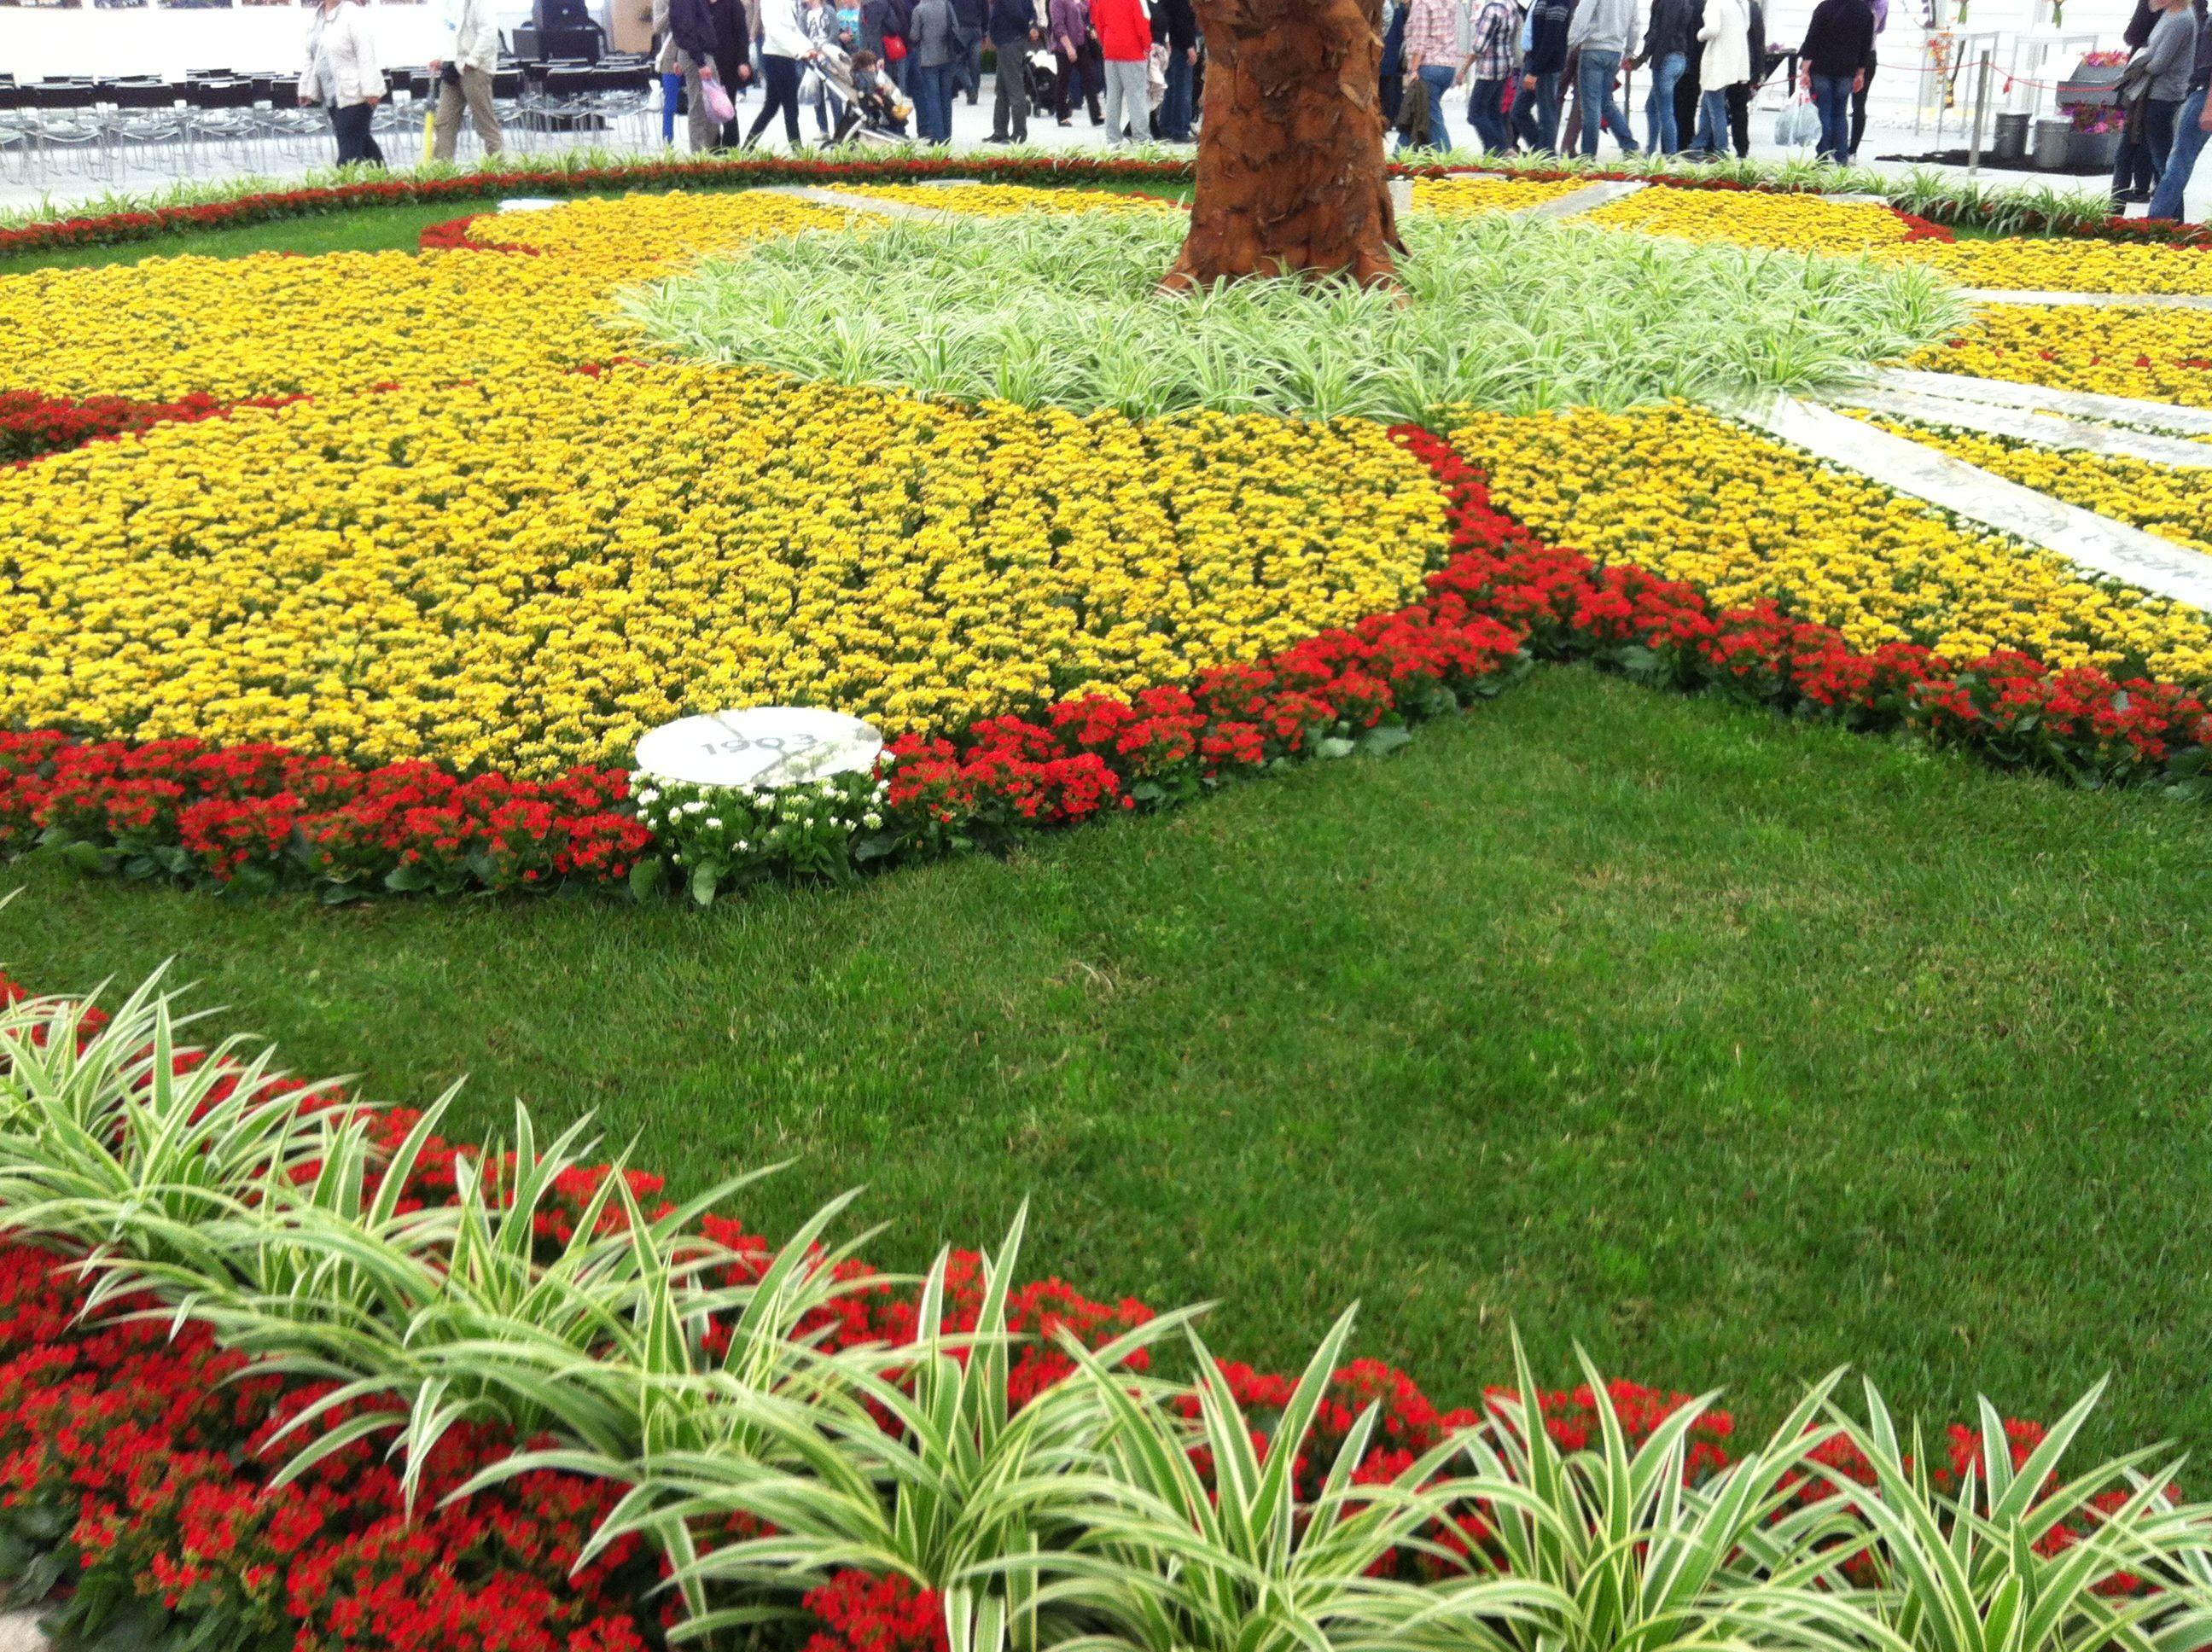 Floraart Zagreb 2013 #11 | Zagreb, Flowers